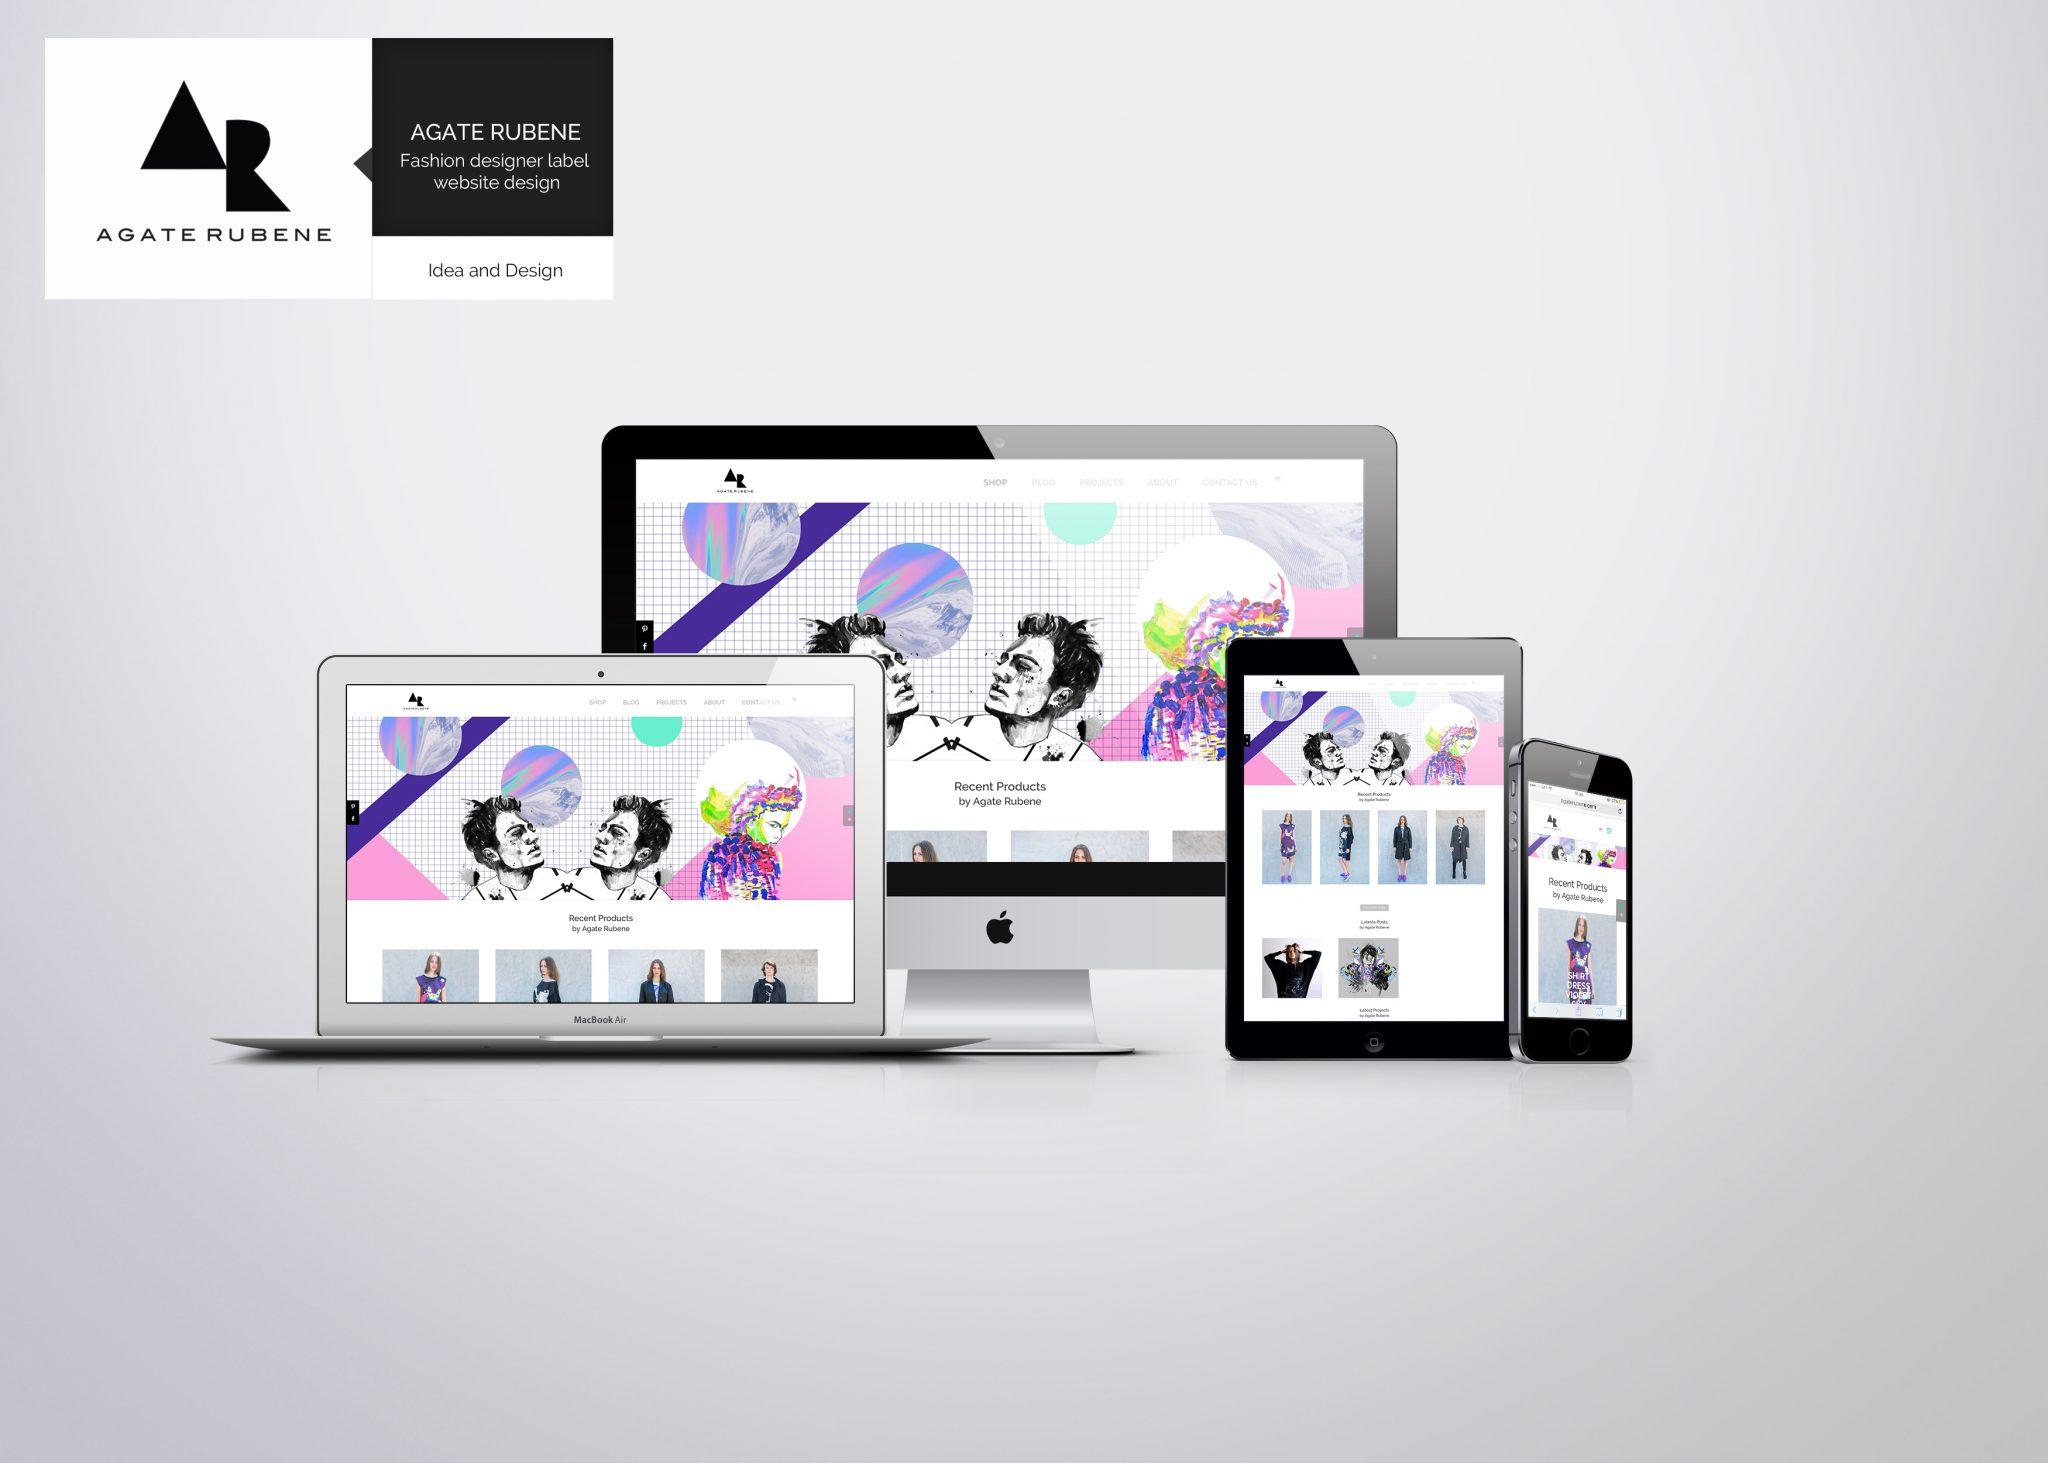 Self branding, website design and illustrations for my clothing label AGATE RUBENE